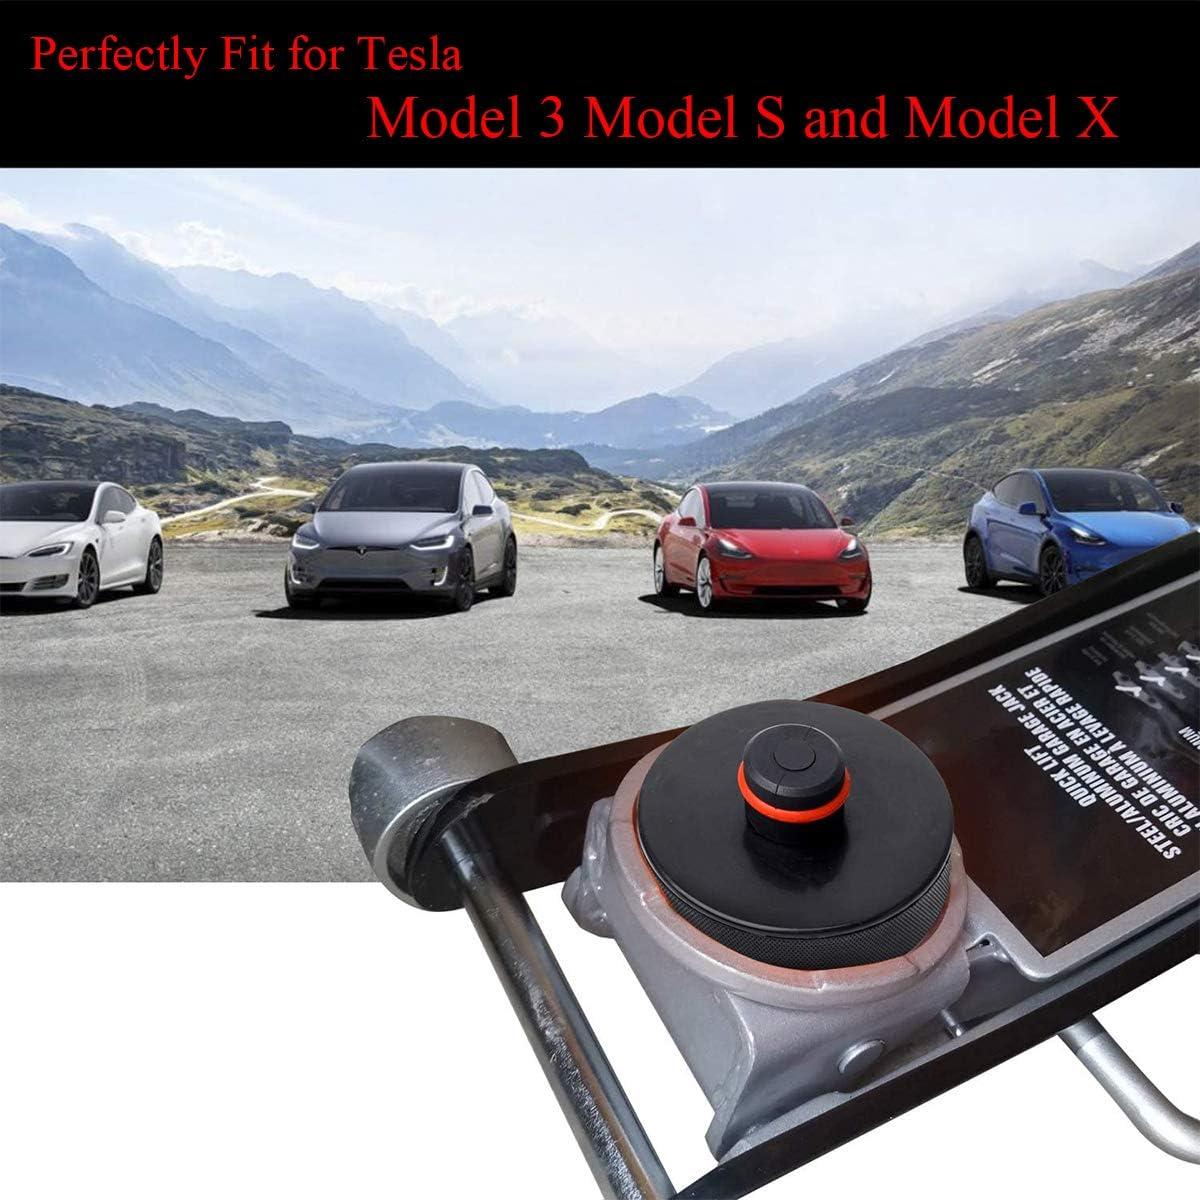 topfit Tesla Model 3 Hubwagenheber Pad 4er Pack Jack Point Pad Stabiler Adapter Gummi Schutz f/ür Model 3 Model S Model X